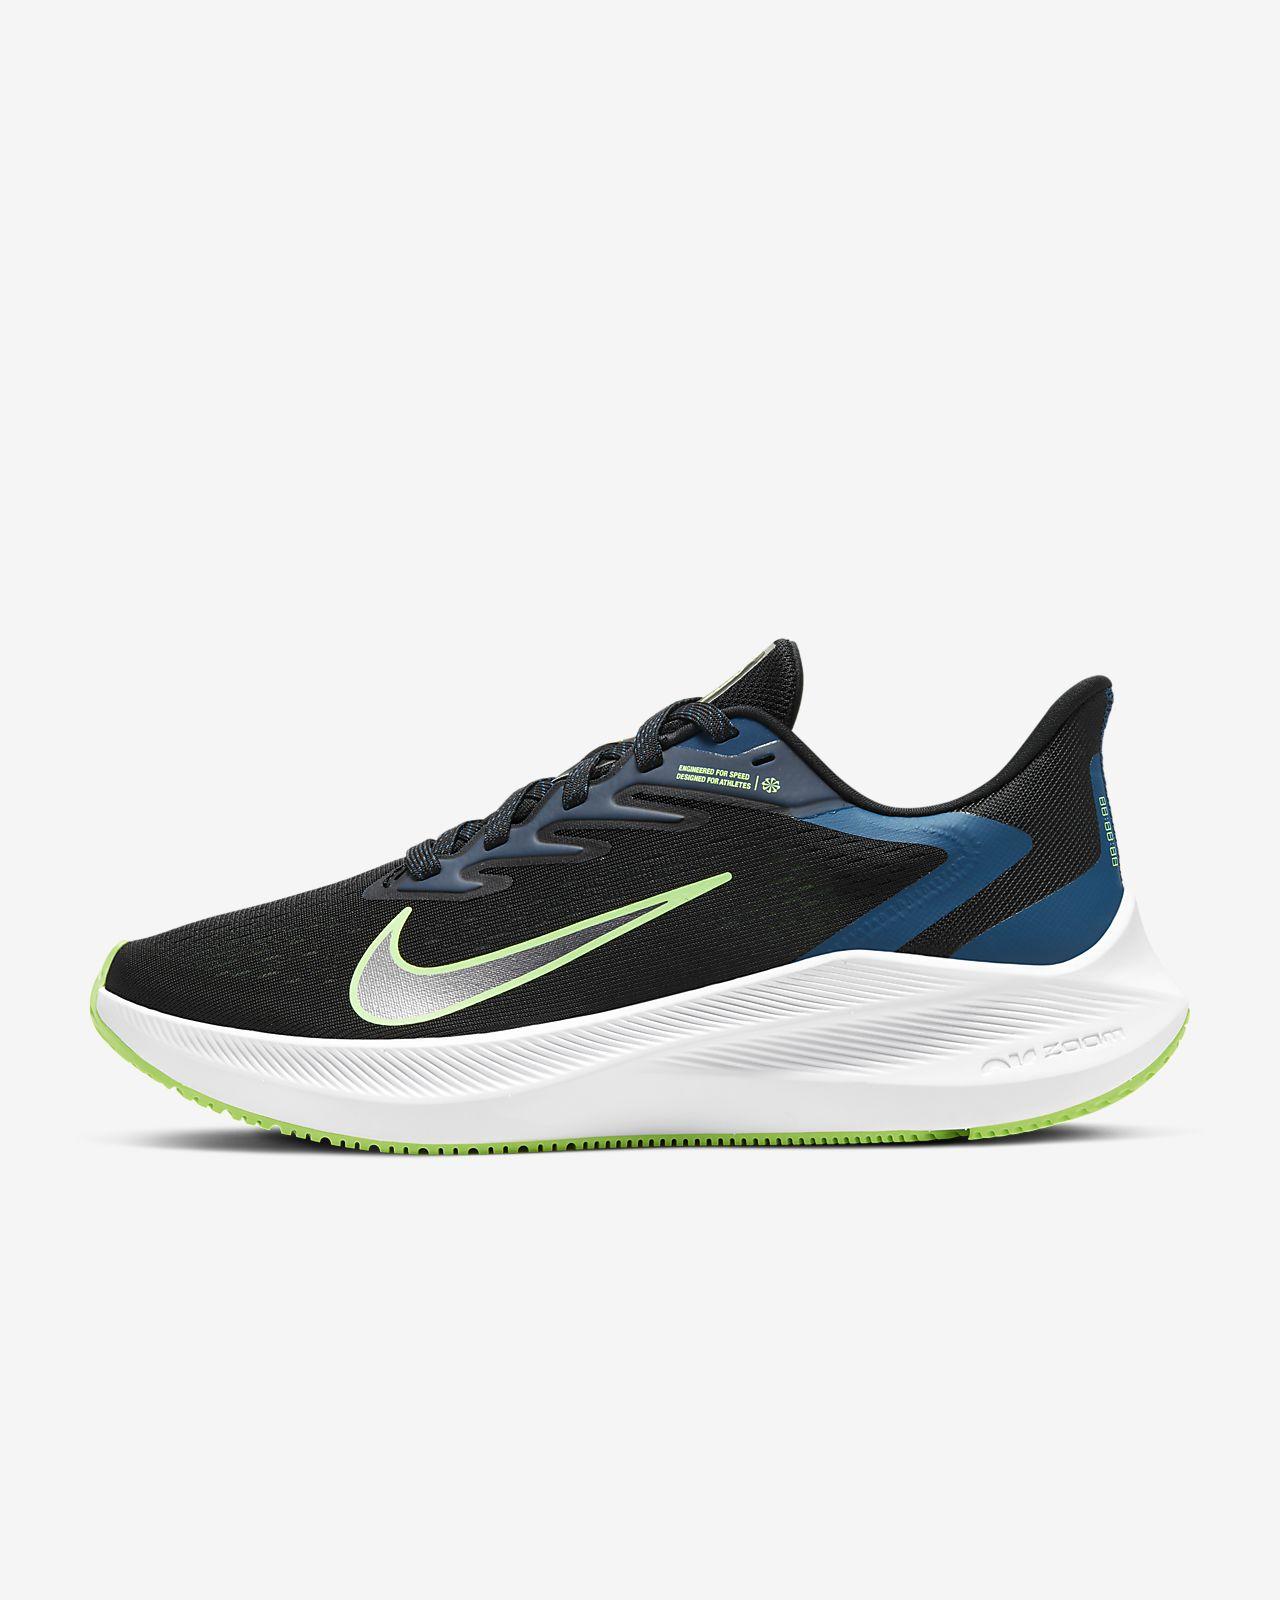 Nike Air Zoom Winflo 7 女款跑鞋